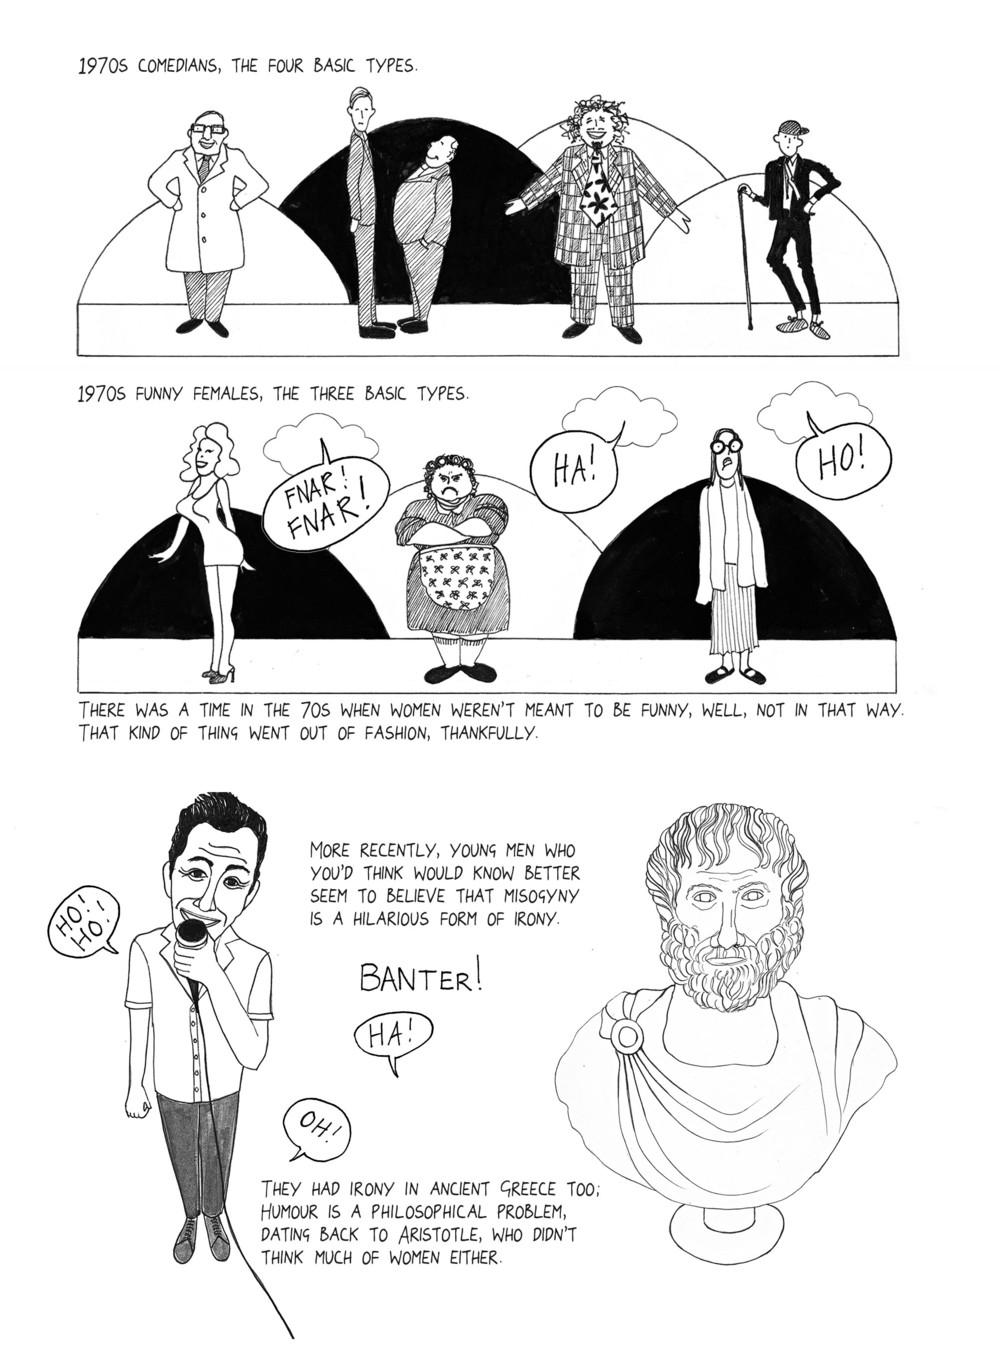 aristotle-page.jpg